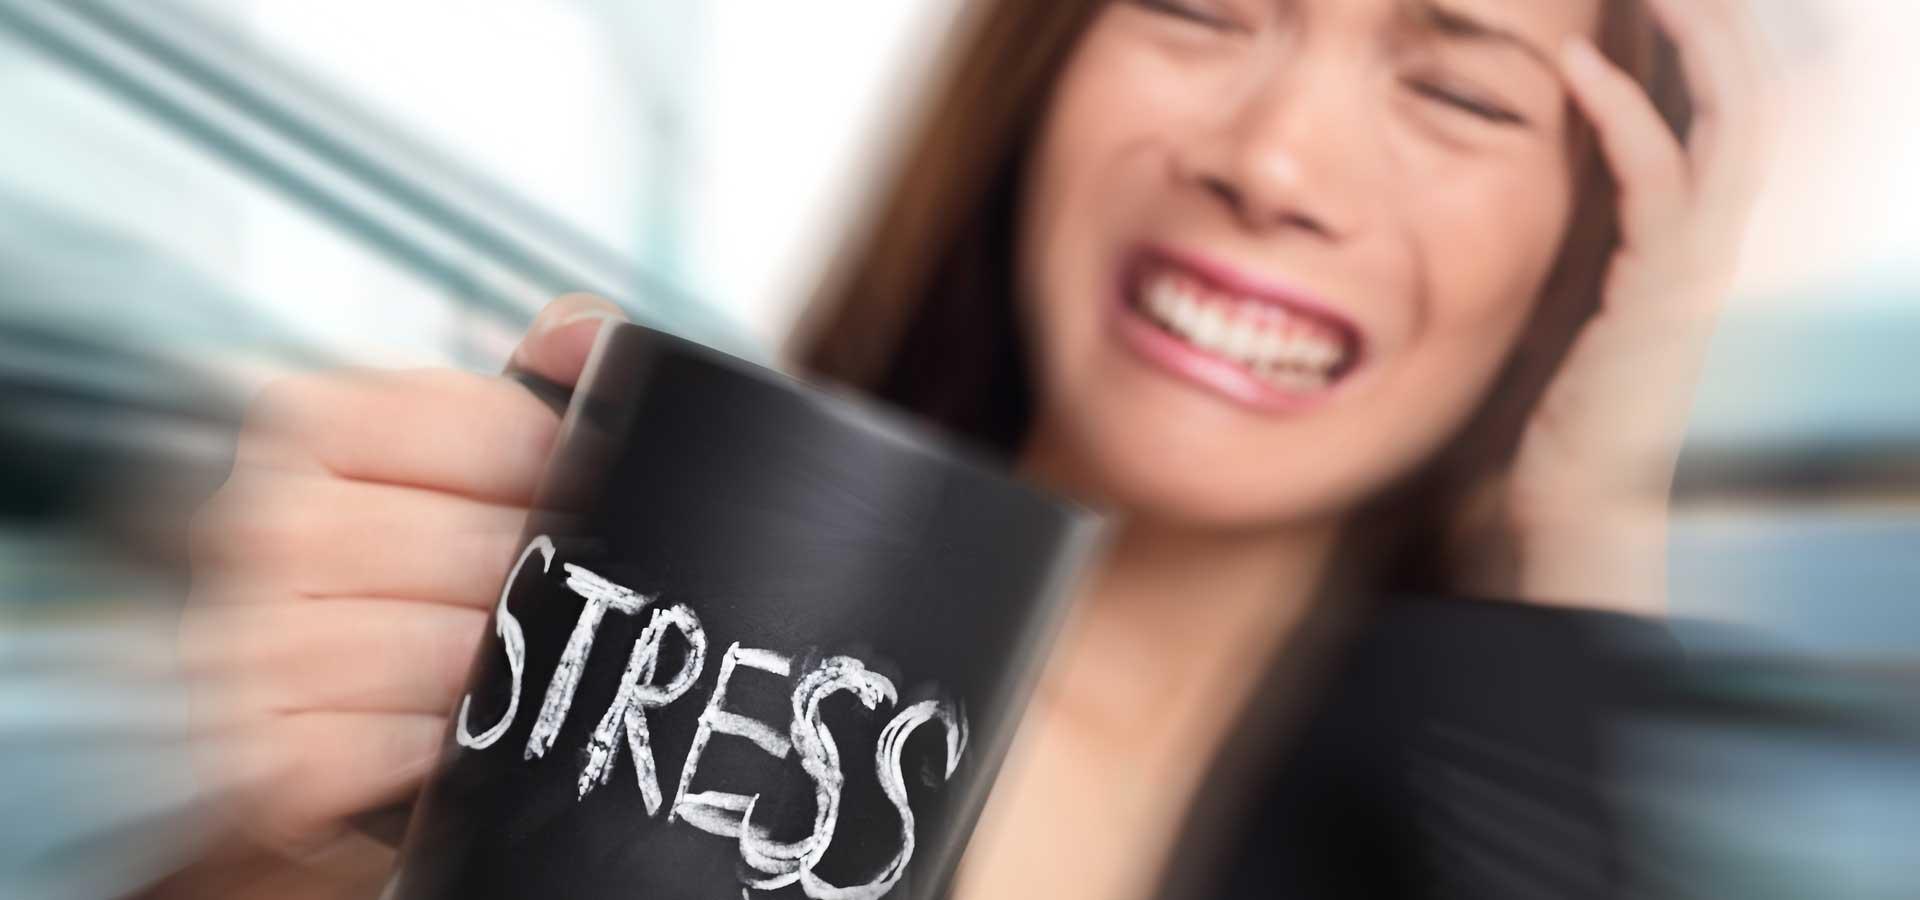 Ketamine for Anxiety Treatment in Woodstock, GA